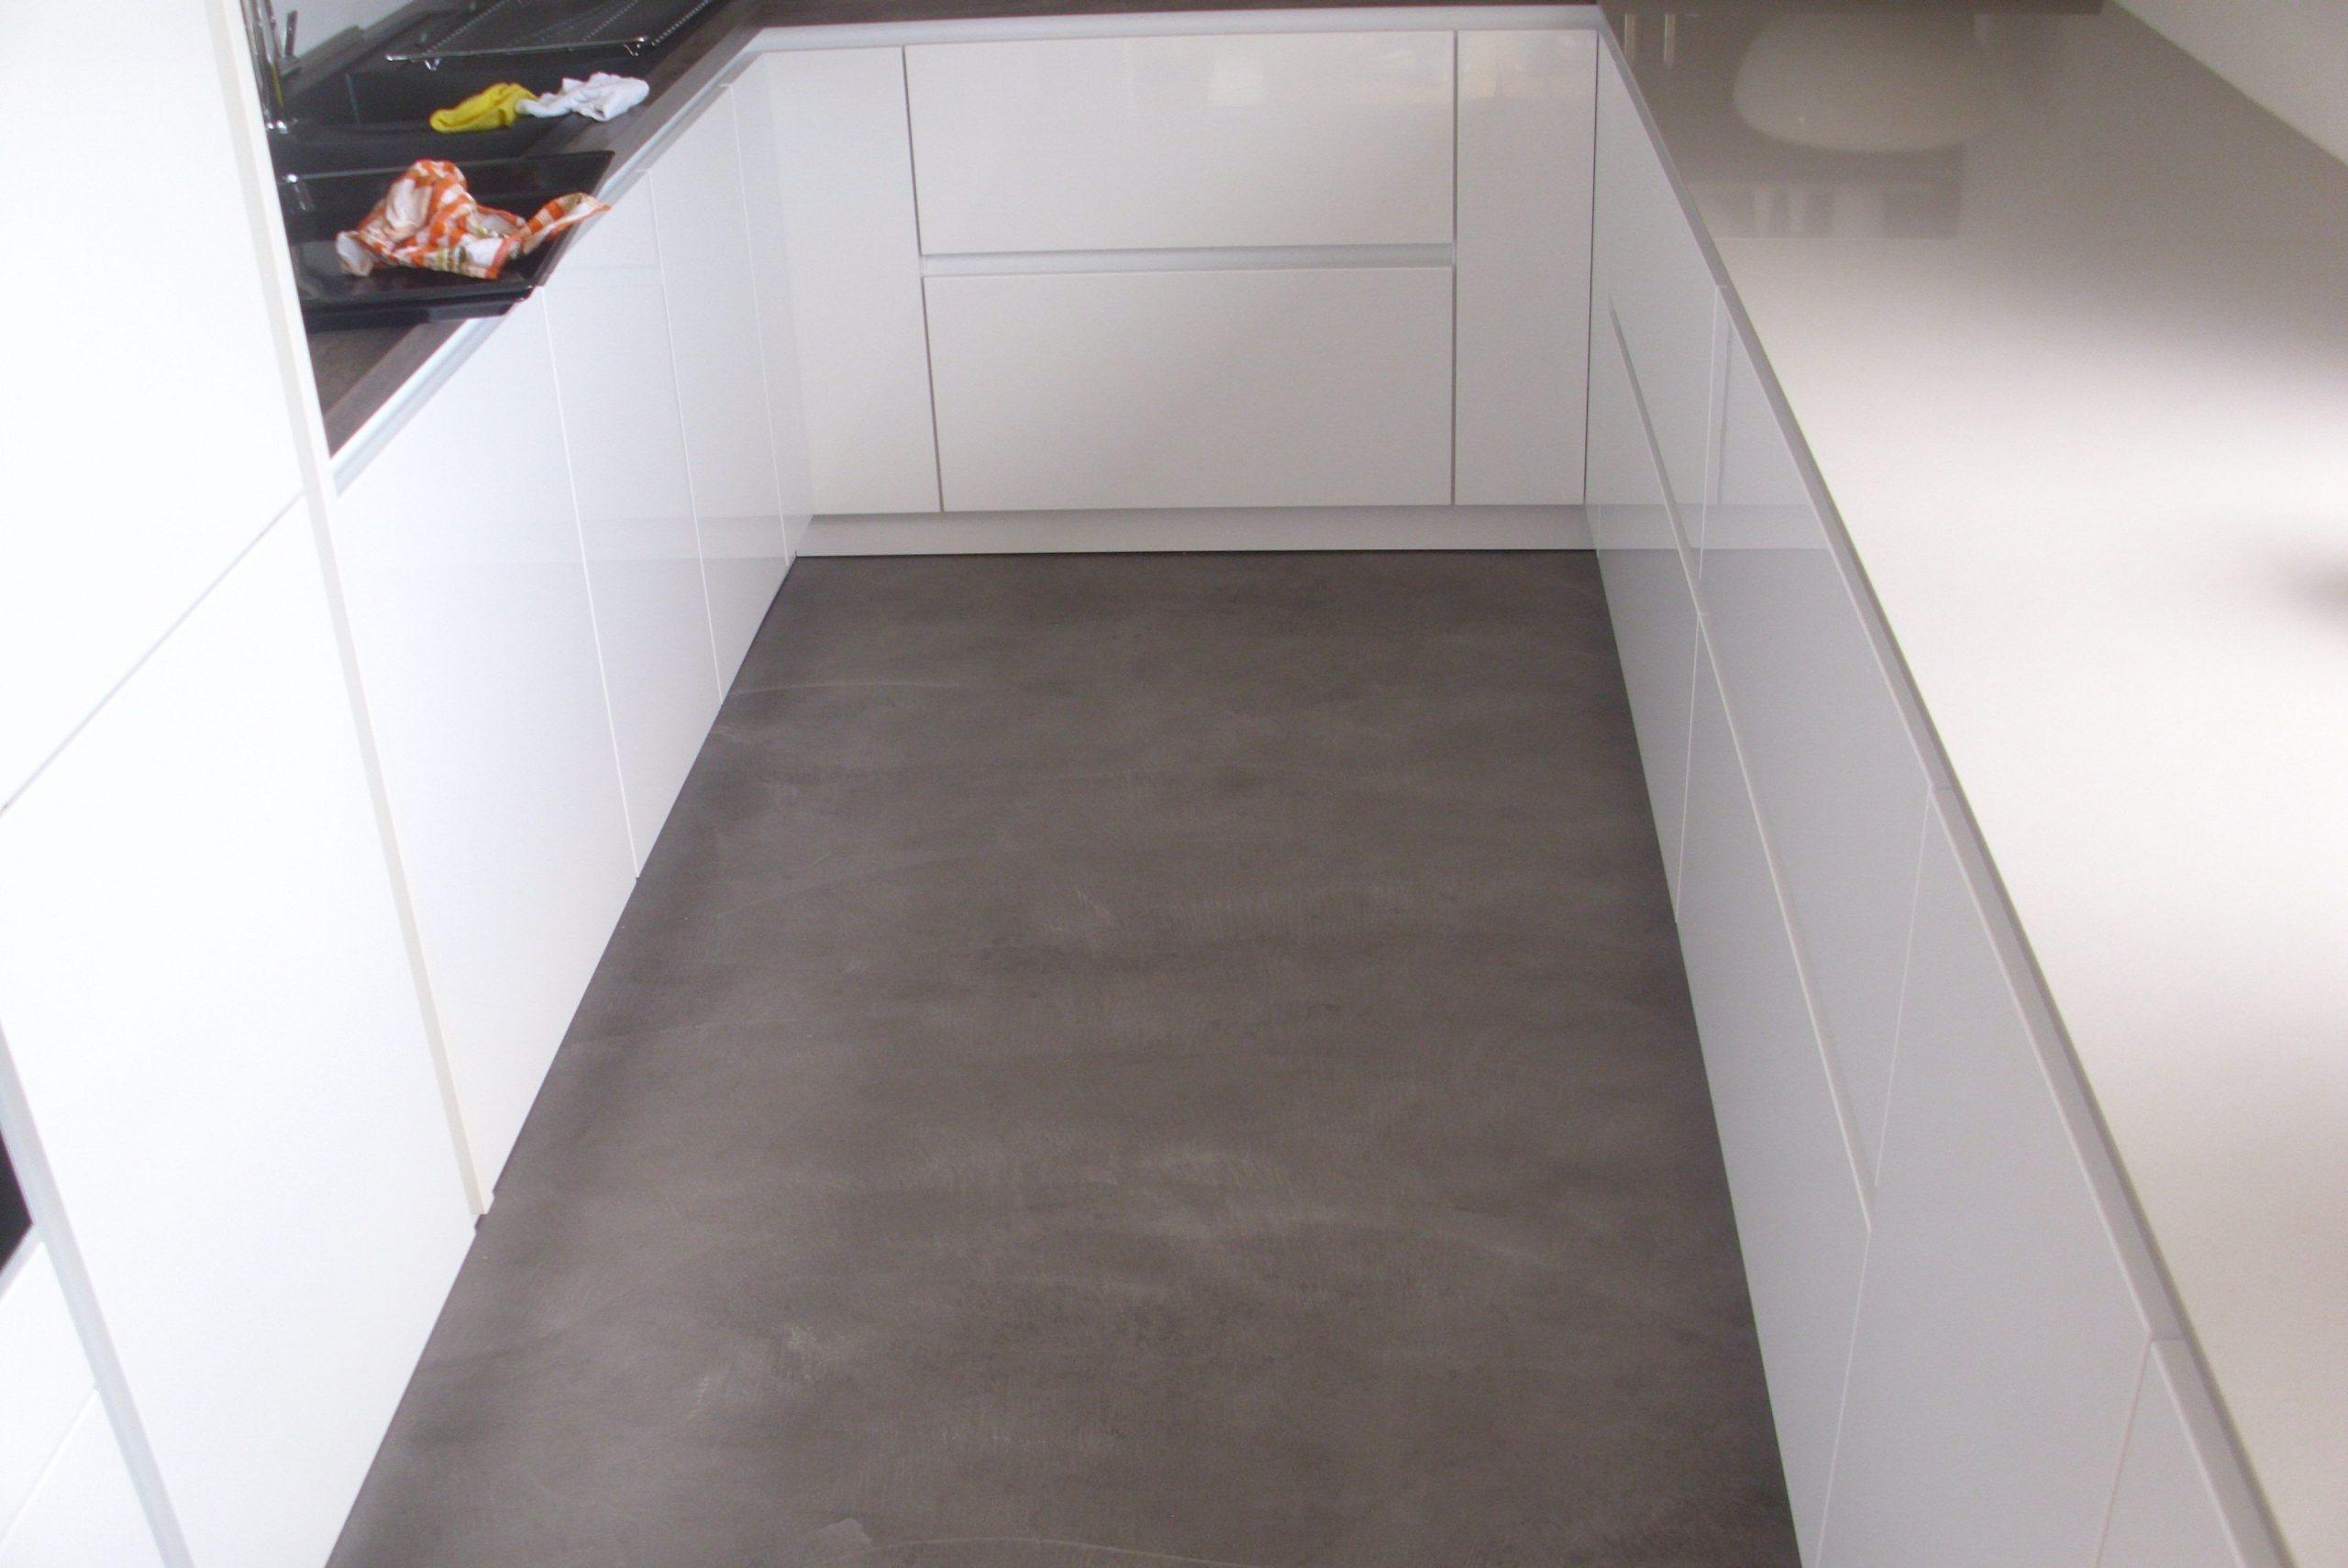 Full Size of Boden übergang Küche Wohnzimmer Küchenboden Ideen Bodenplatten Küche Boden Kleine Küche Küche Bodenbelag Küche